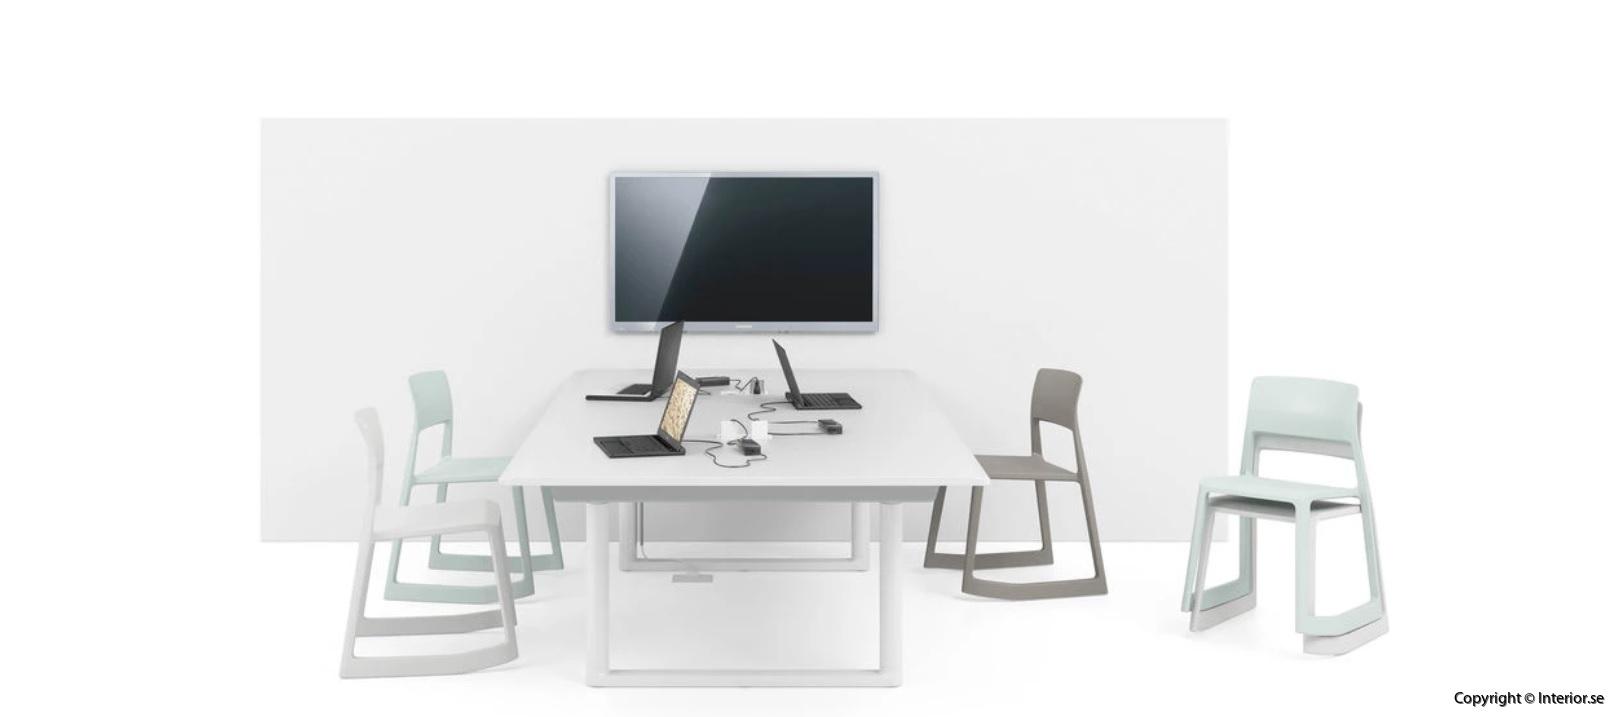 Höj- & sänkbart konferensbord, Vitra Tyde Meeting Table 240 cm - Ronan Erwan Bouroullec  7